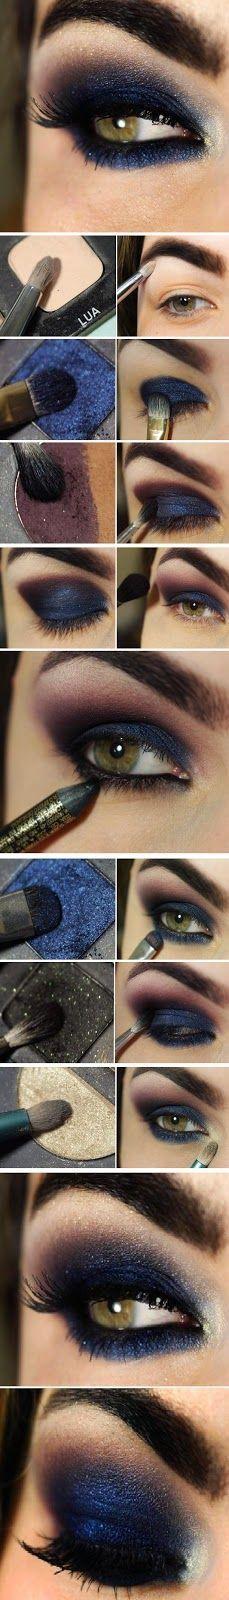 DIY Navy Blue Eye Makeup